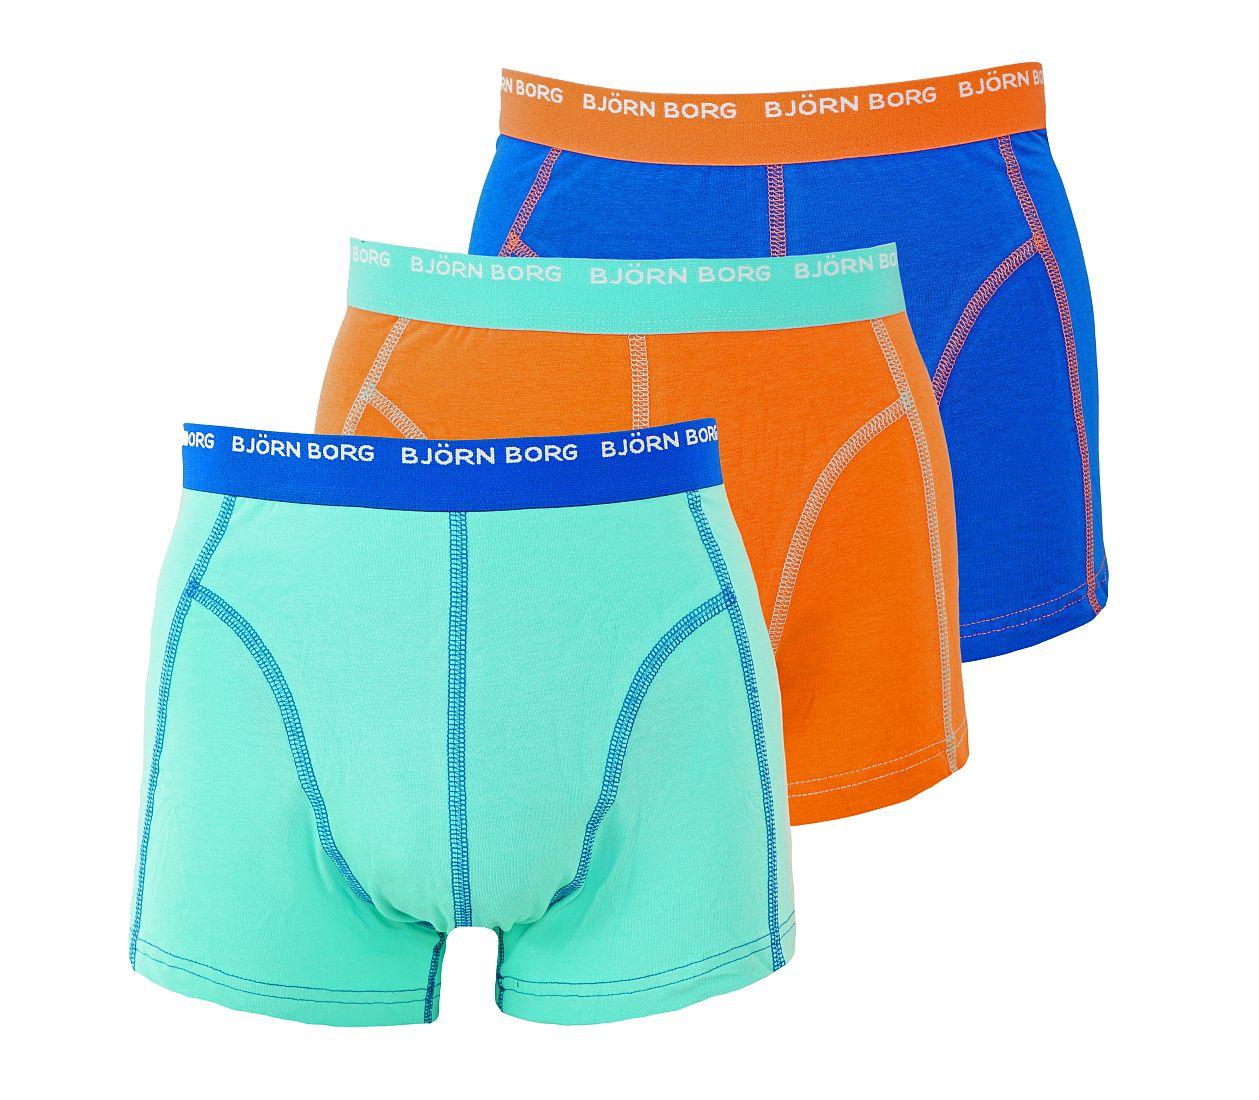 Björn Borg 3er Pack Shorts Boxershorts Unterhosen Shorts 161803 108023 30331 HW16